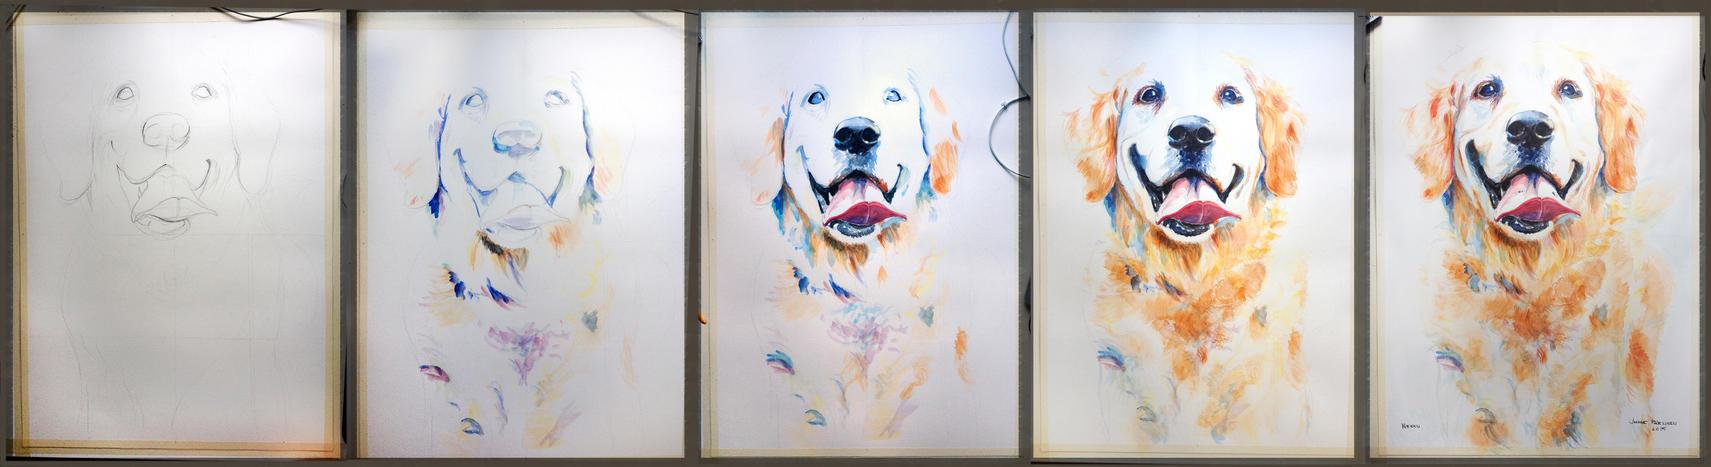 Aquarelle dog steps by JIIP33